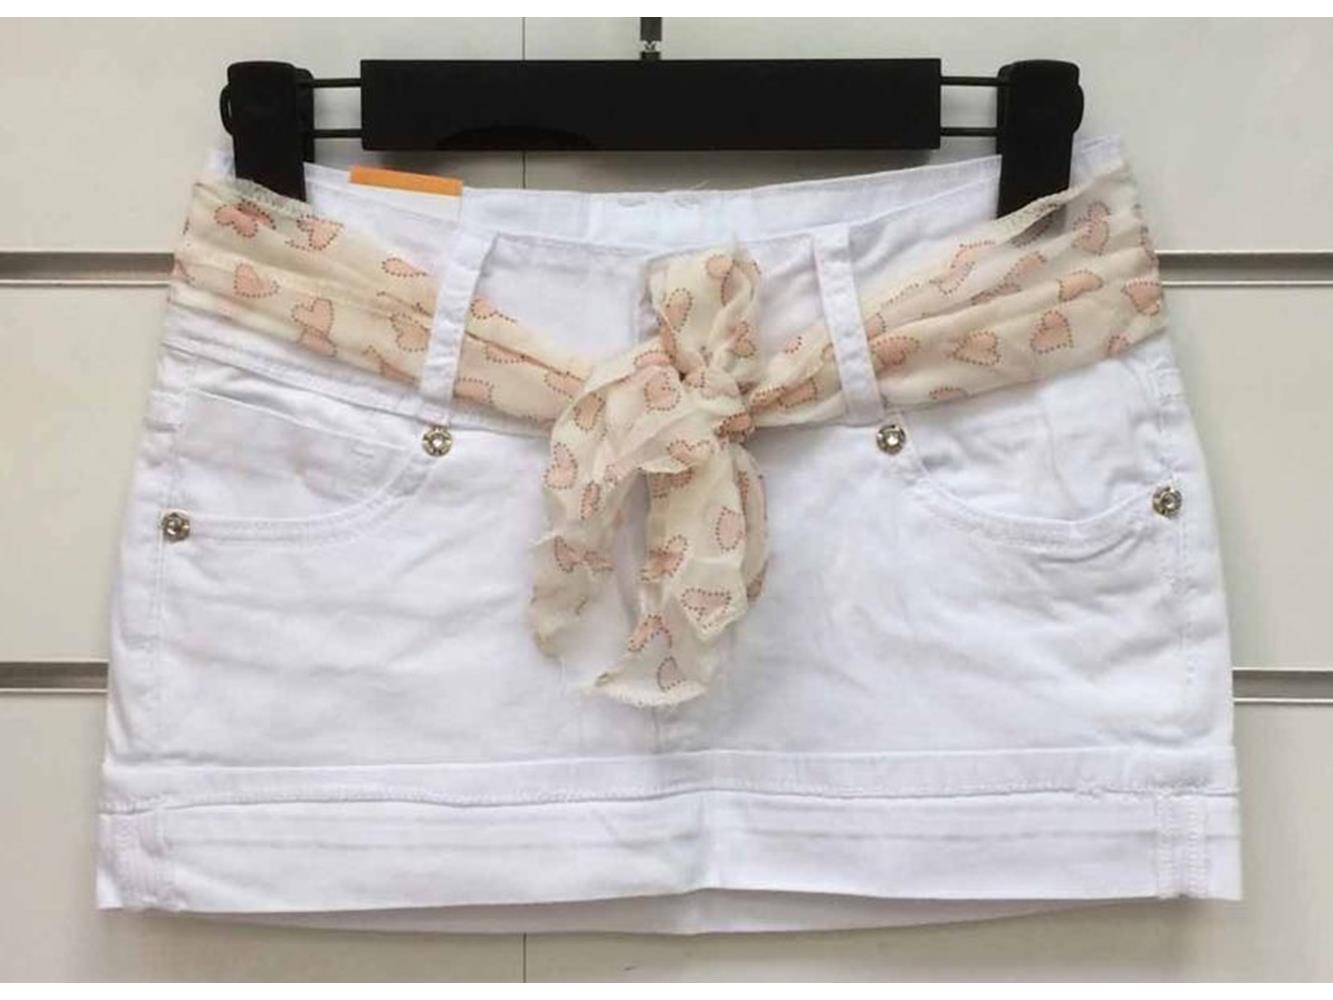 minigonna con strass e foulard